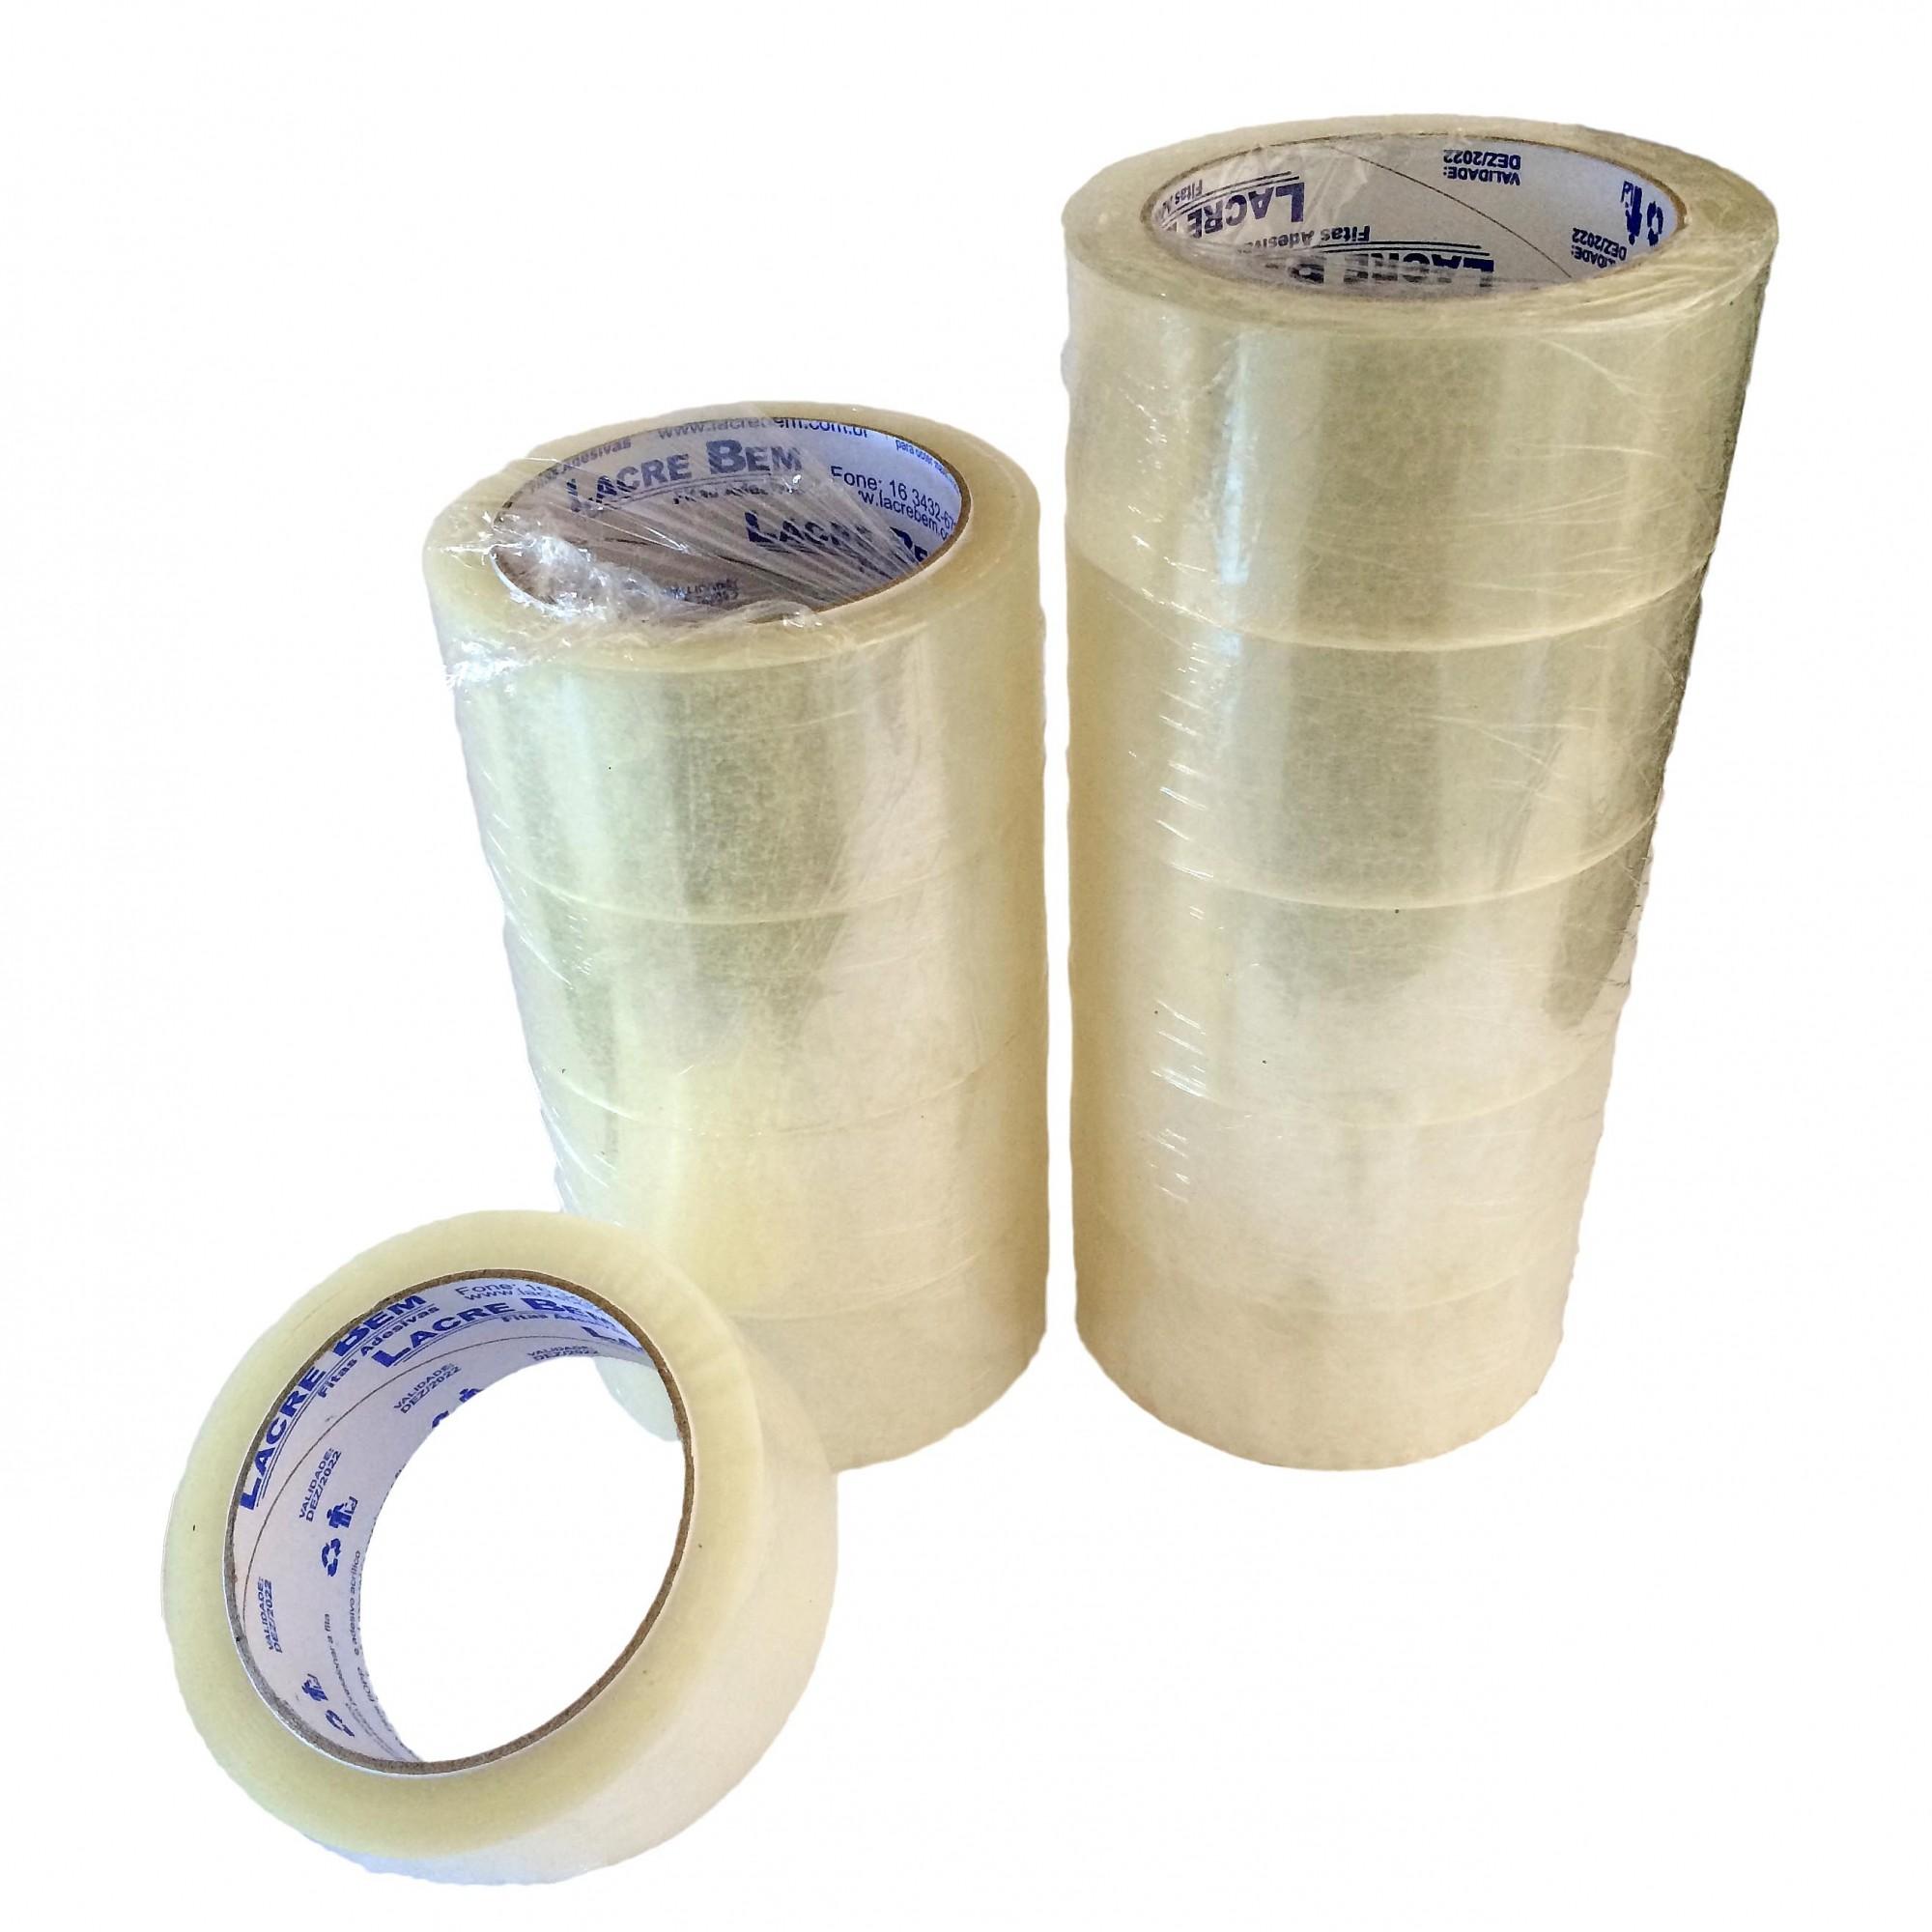 Kit 10 Rolos Fita Adesiva Transparente Lacre Bem 45mm x 100 METROS